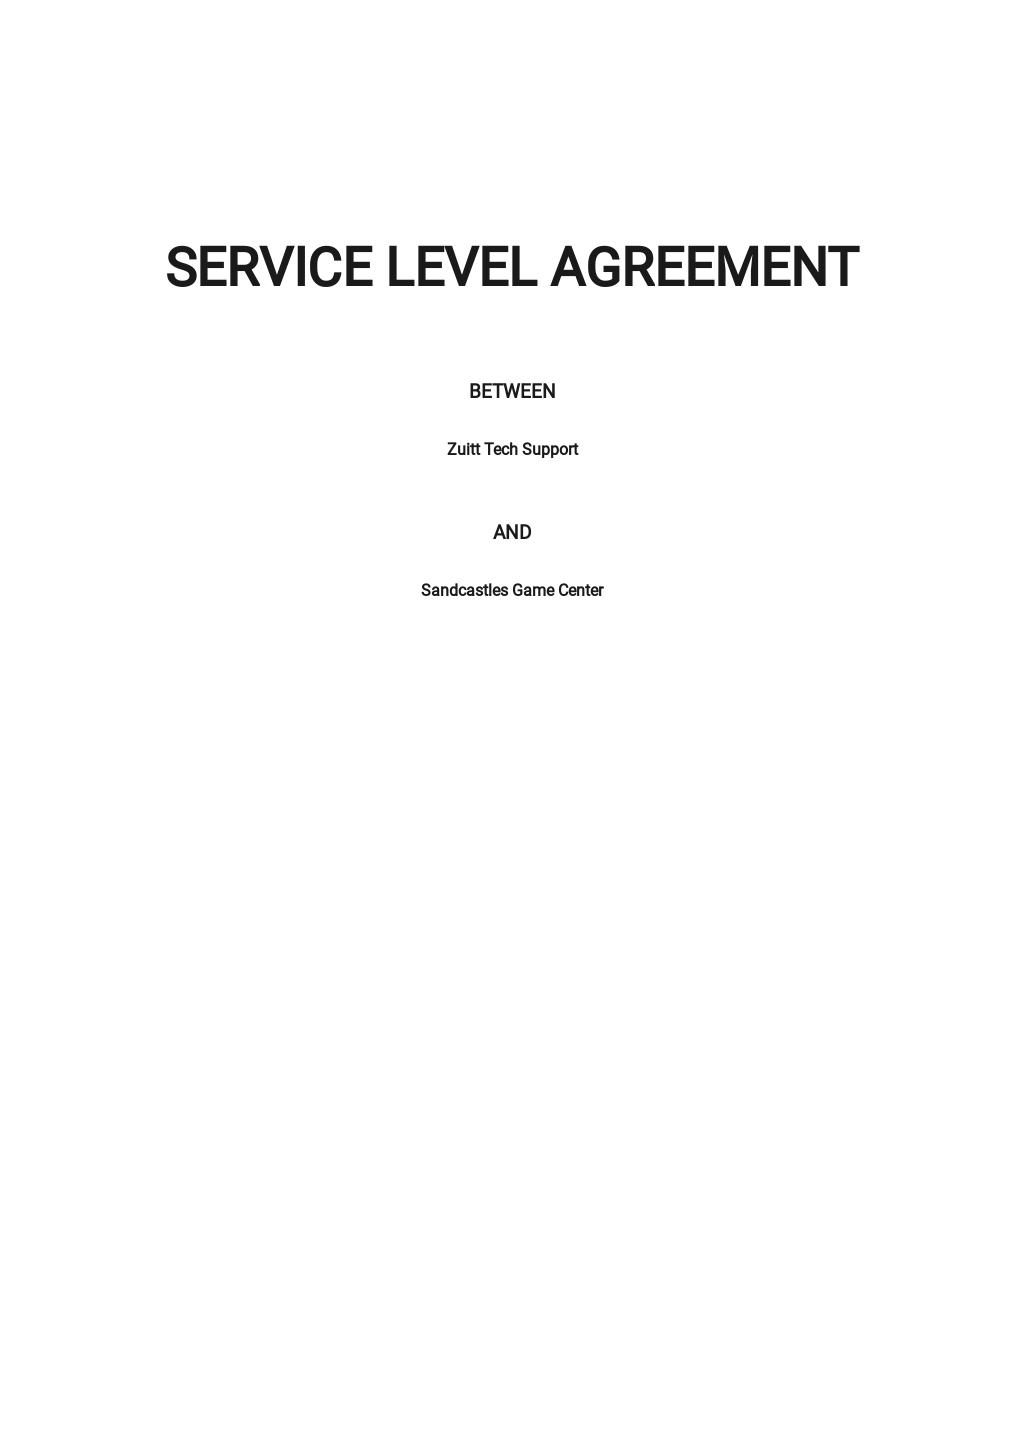 Service Level Agreement Template.jpe